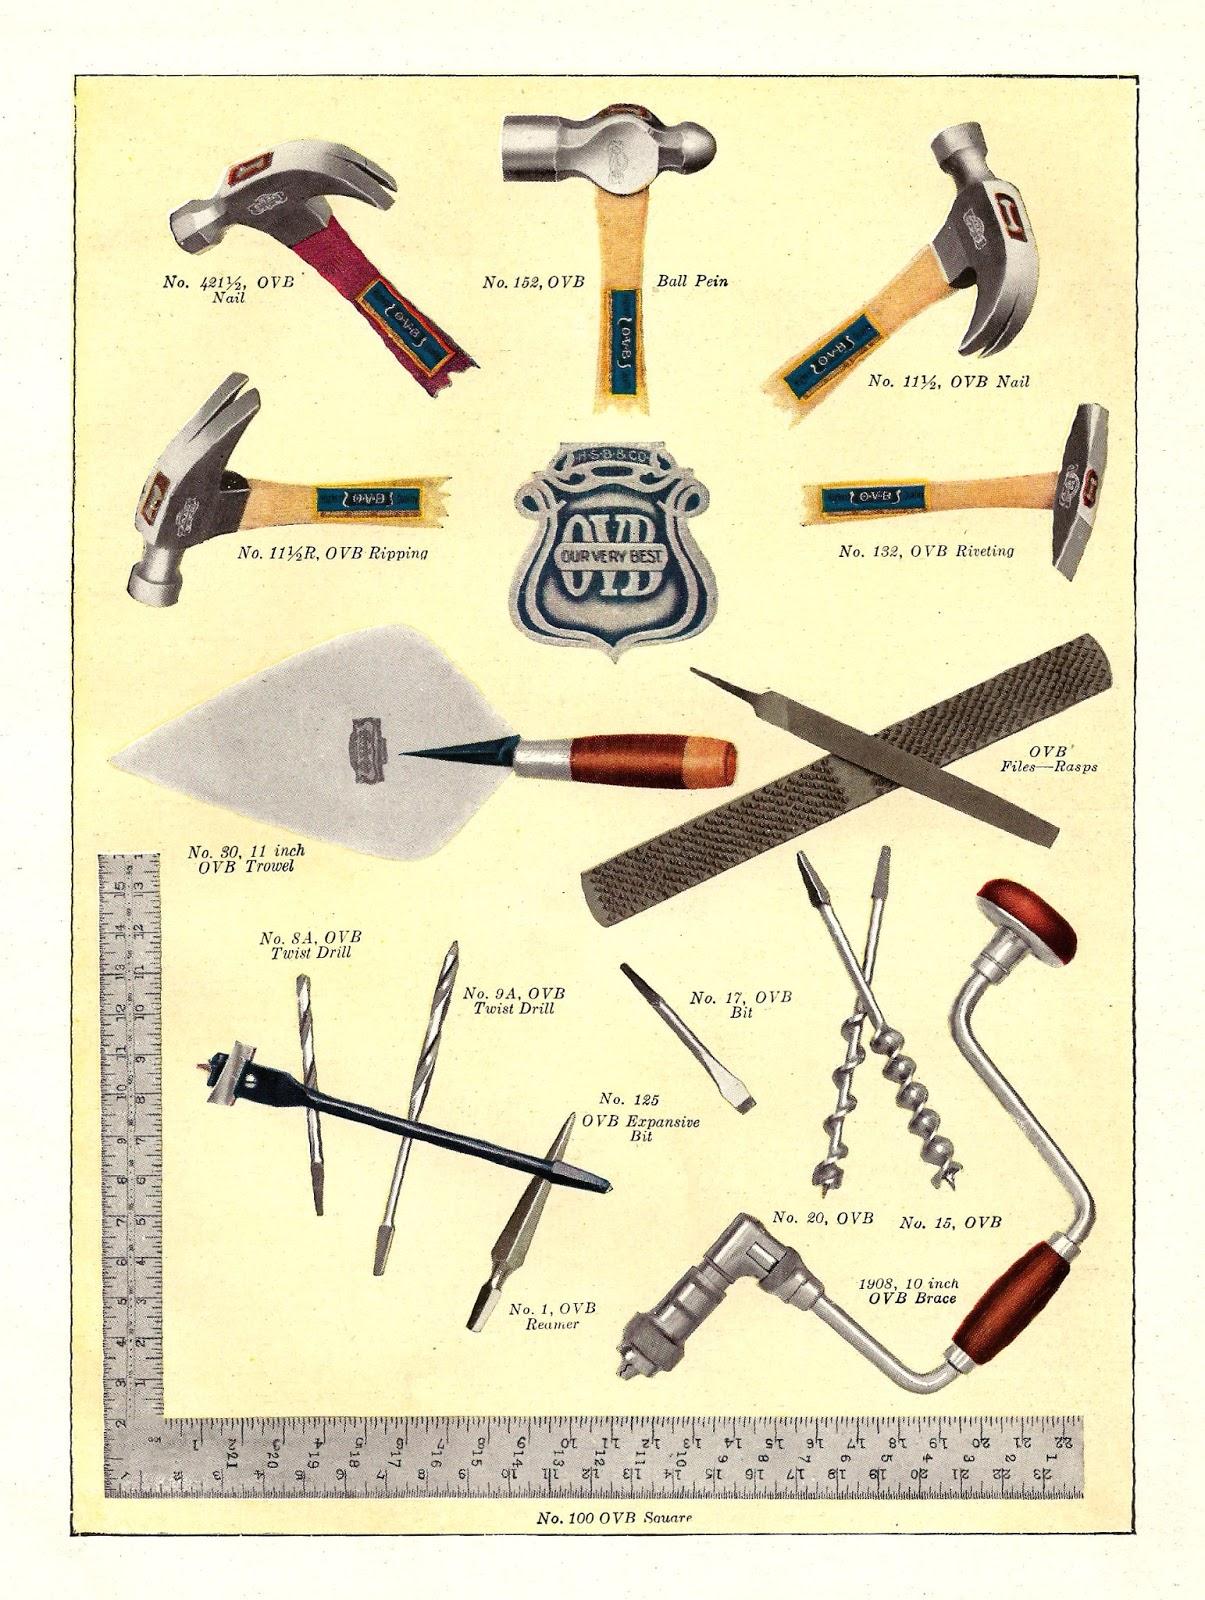 263 Antique Retro Hand Tools Old Vintage Toolbox Photos